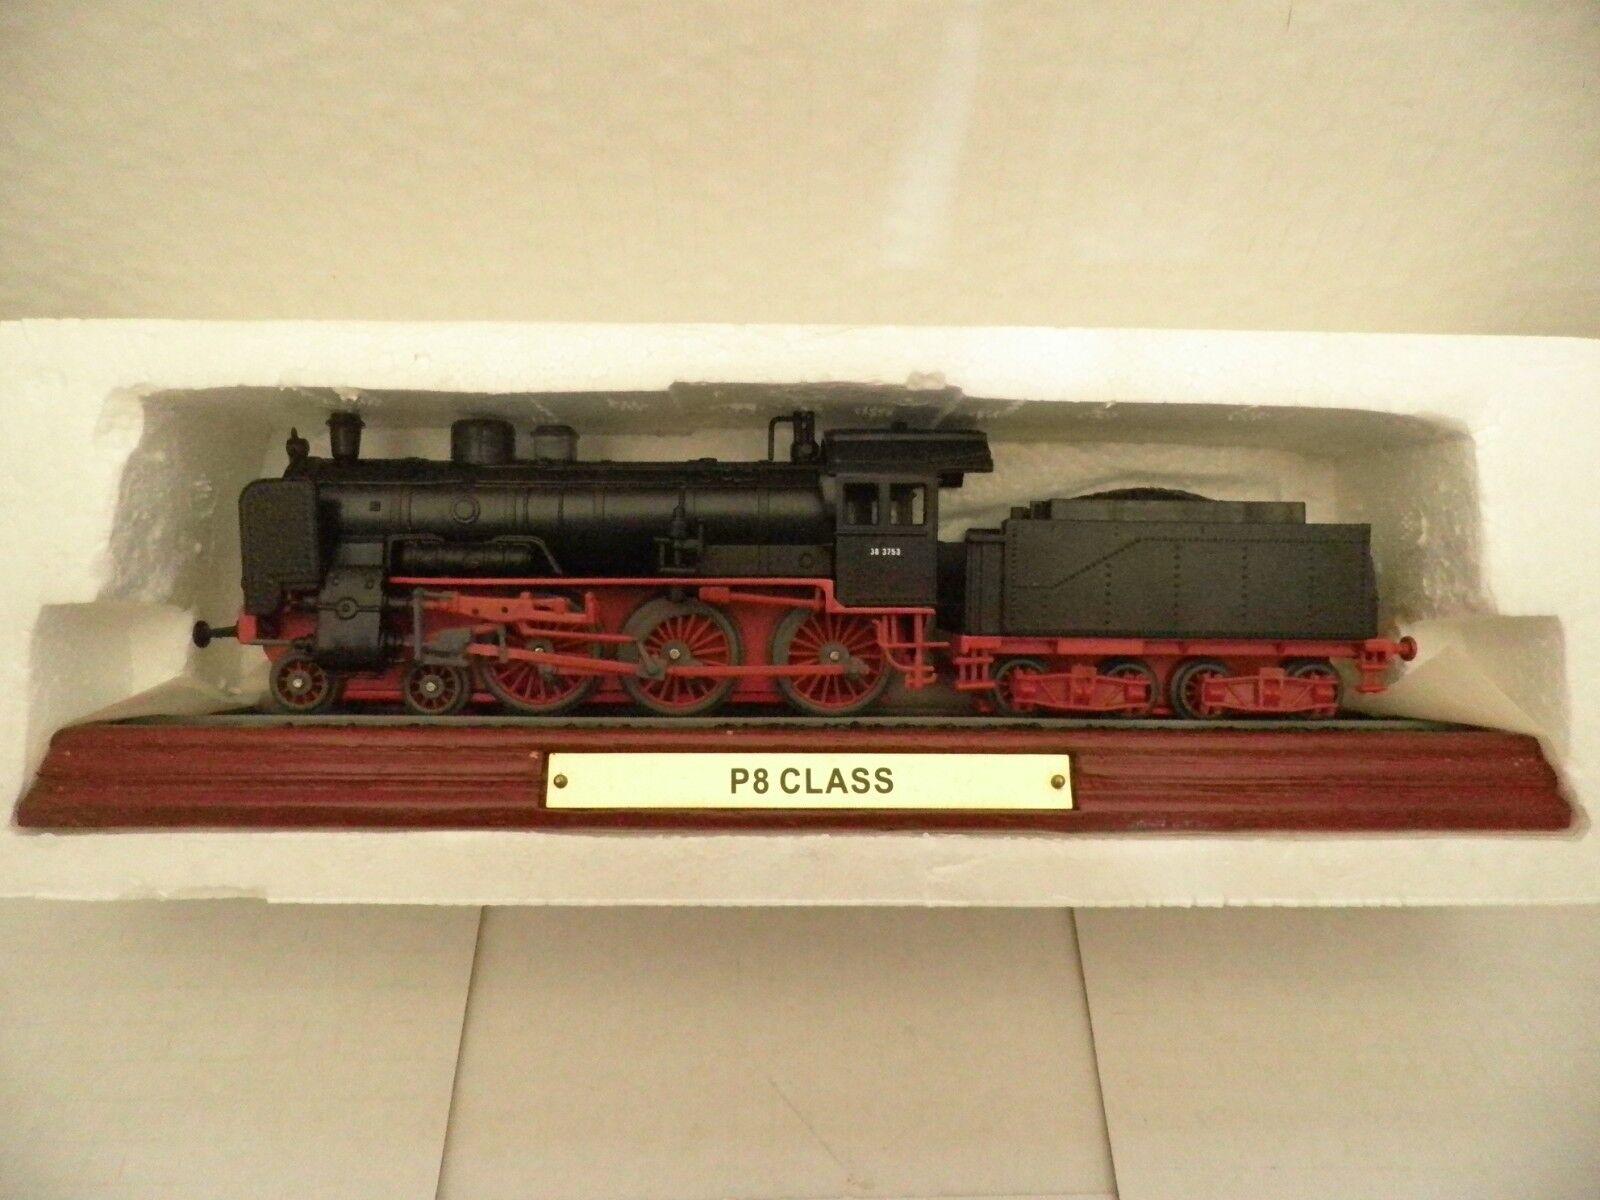 ATLAS Locomotive Model P8 CLASS No.3 904 006. Plastic model model model on plinth.  Ahorre 35% - 70% de descuento